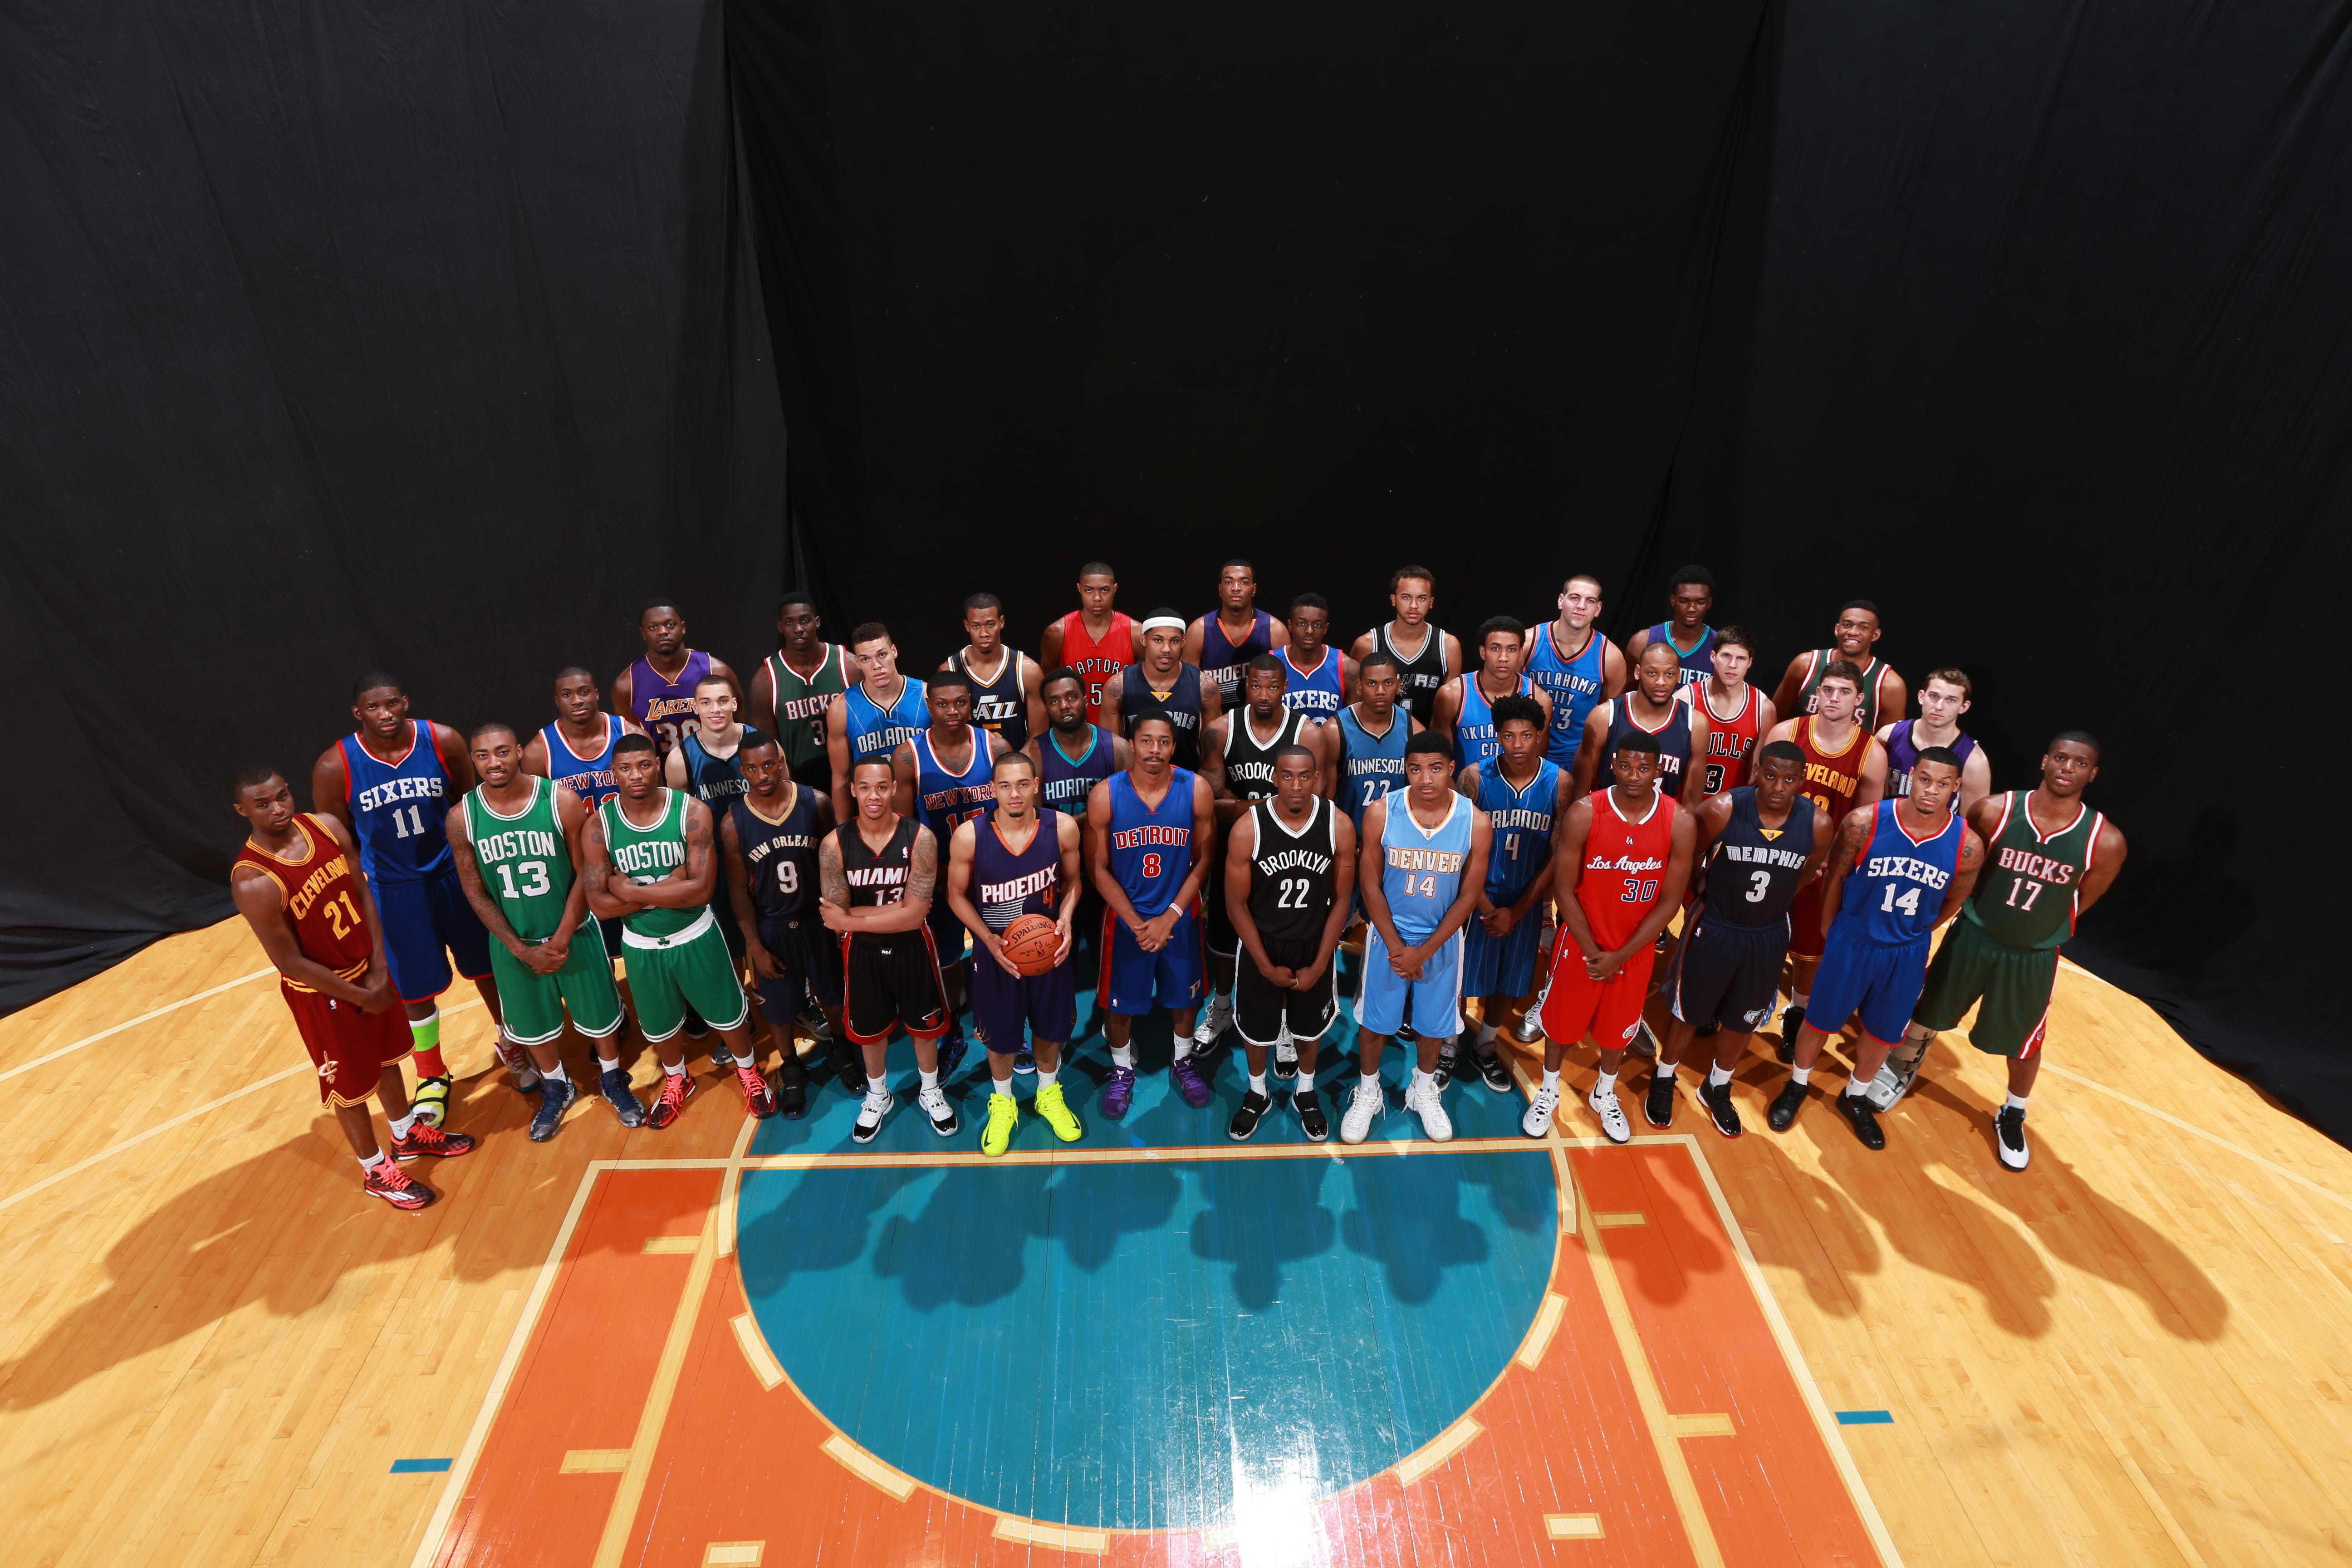 NBA rookie photo shoot face superlatives